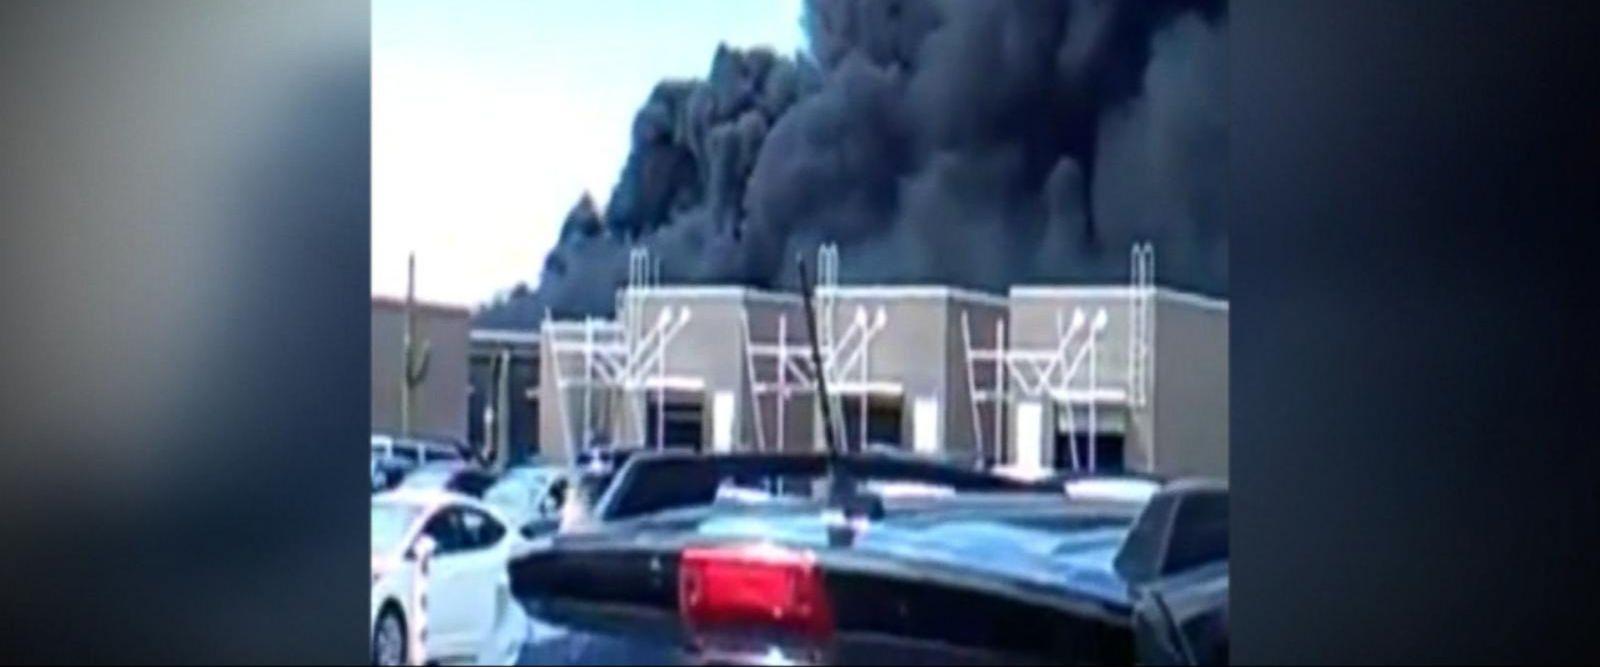 VIDEO: Index: Deadly Plane Crash at Airport in Tucson, Arizona